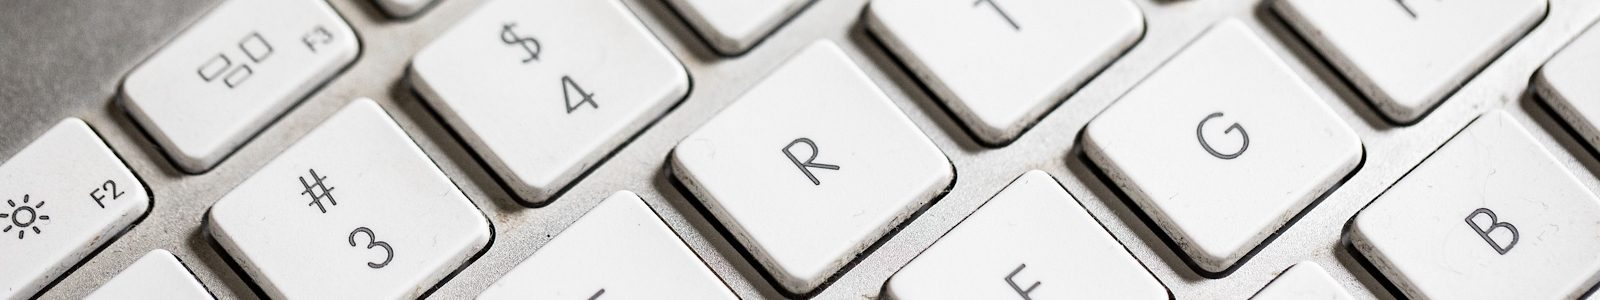 closeup on computer keyboard